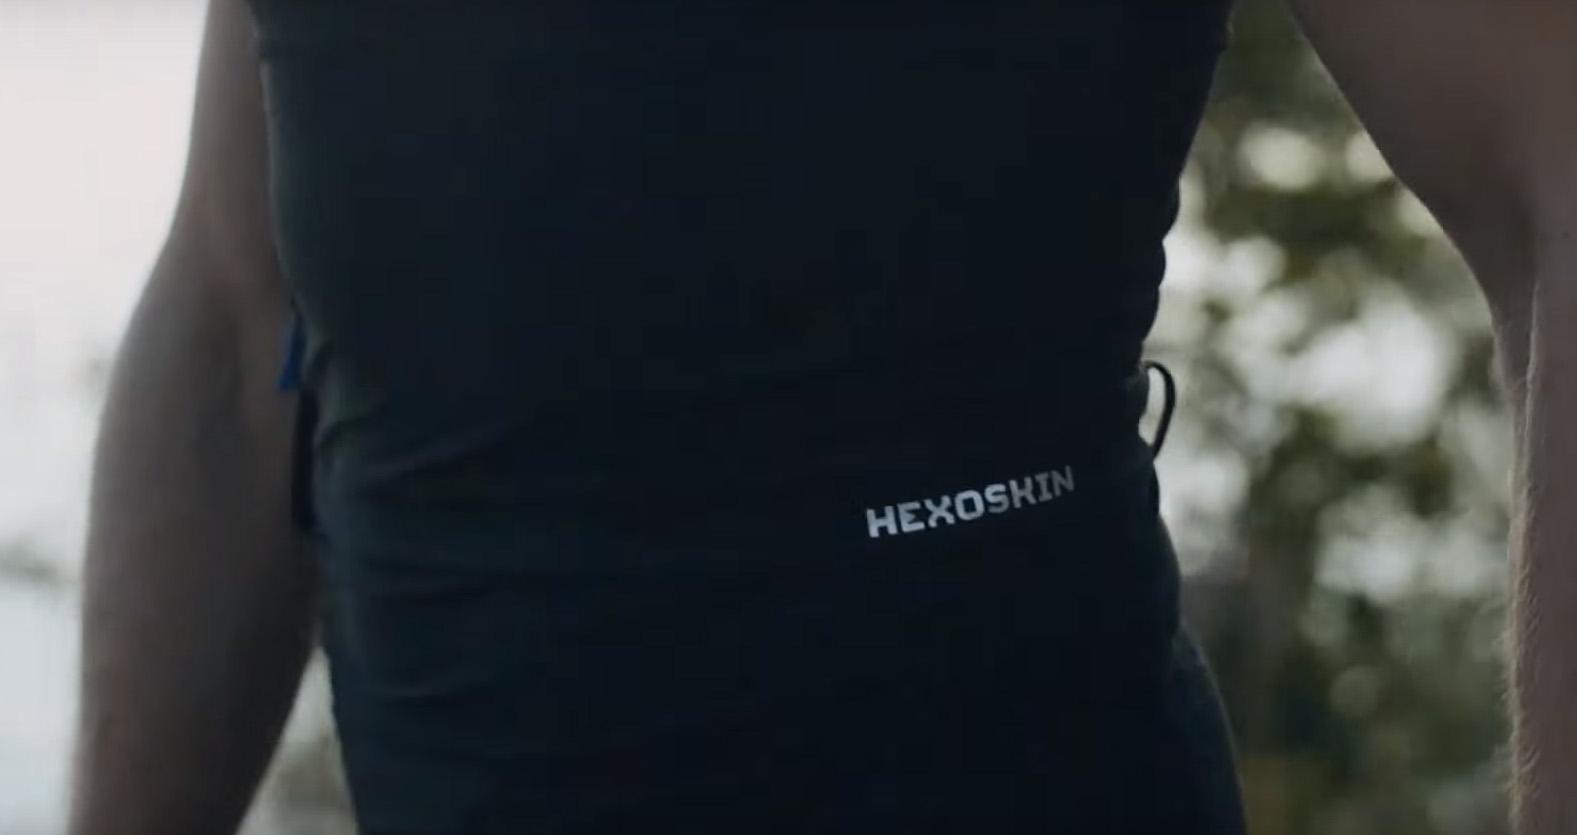 Hexoskin-Smart-Shirt